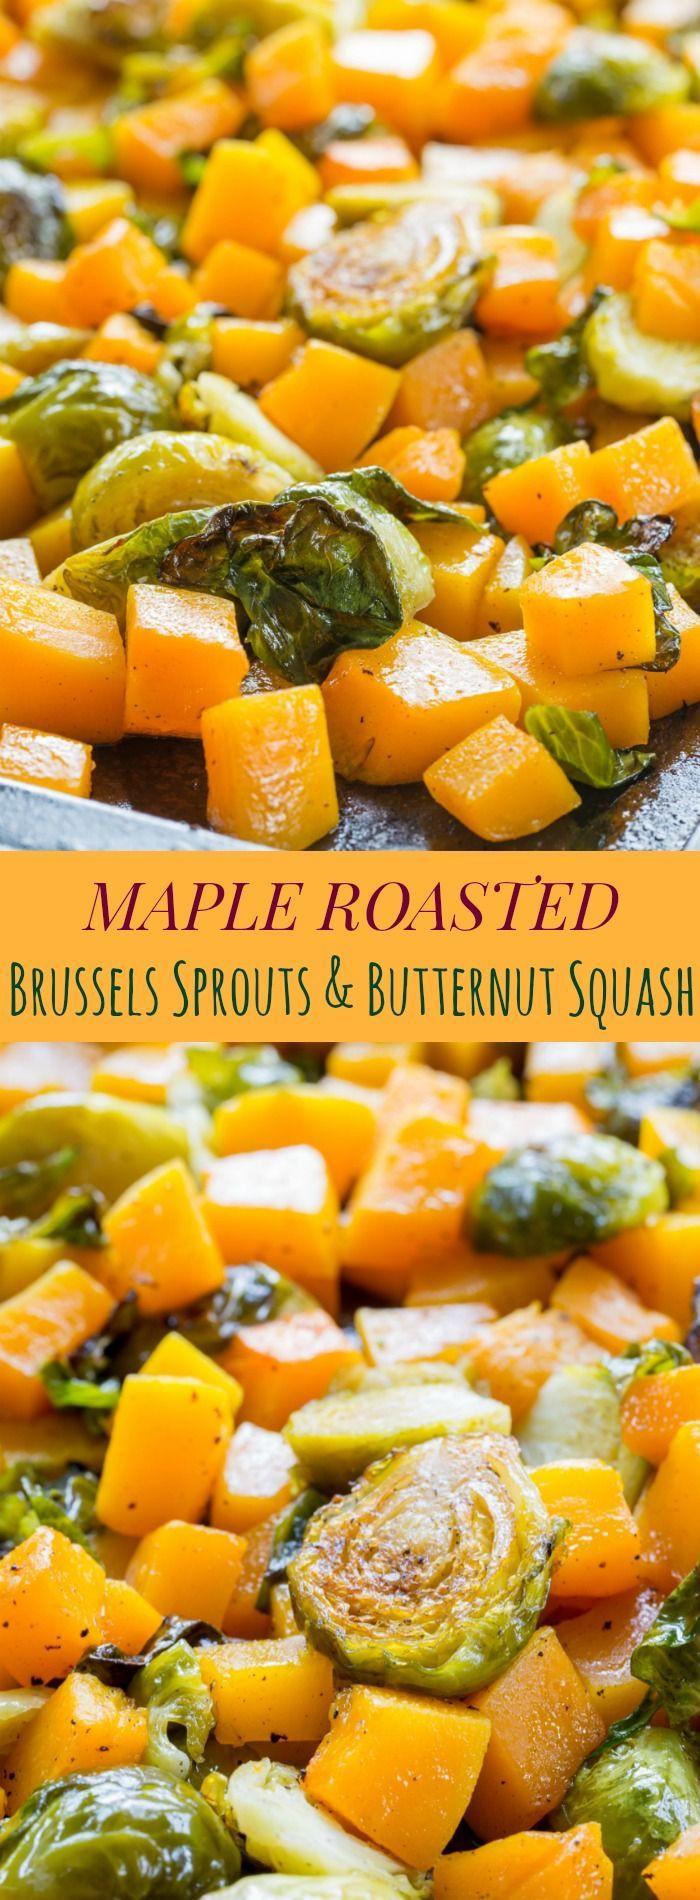 Butternut Squash Dinner Recipes  25 best Vegan Butternut Squash Recipes ideas on Pinterest